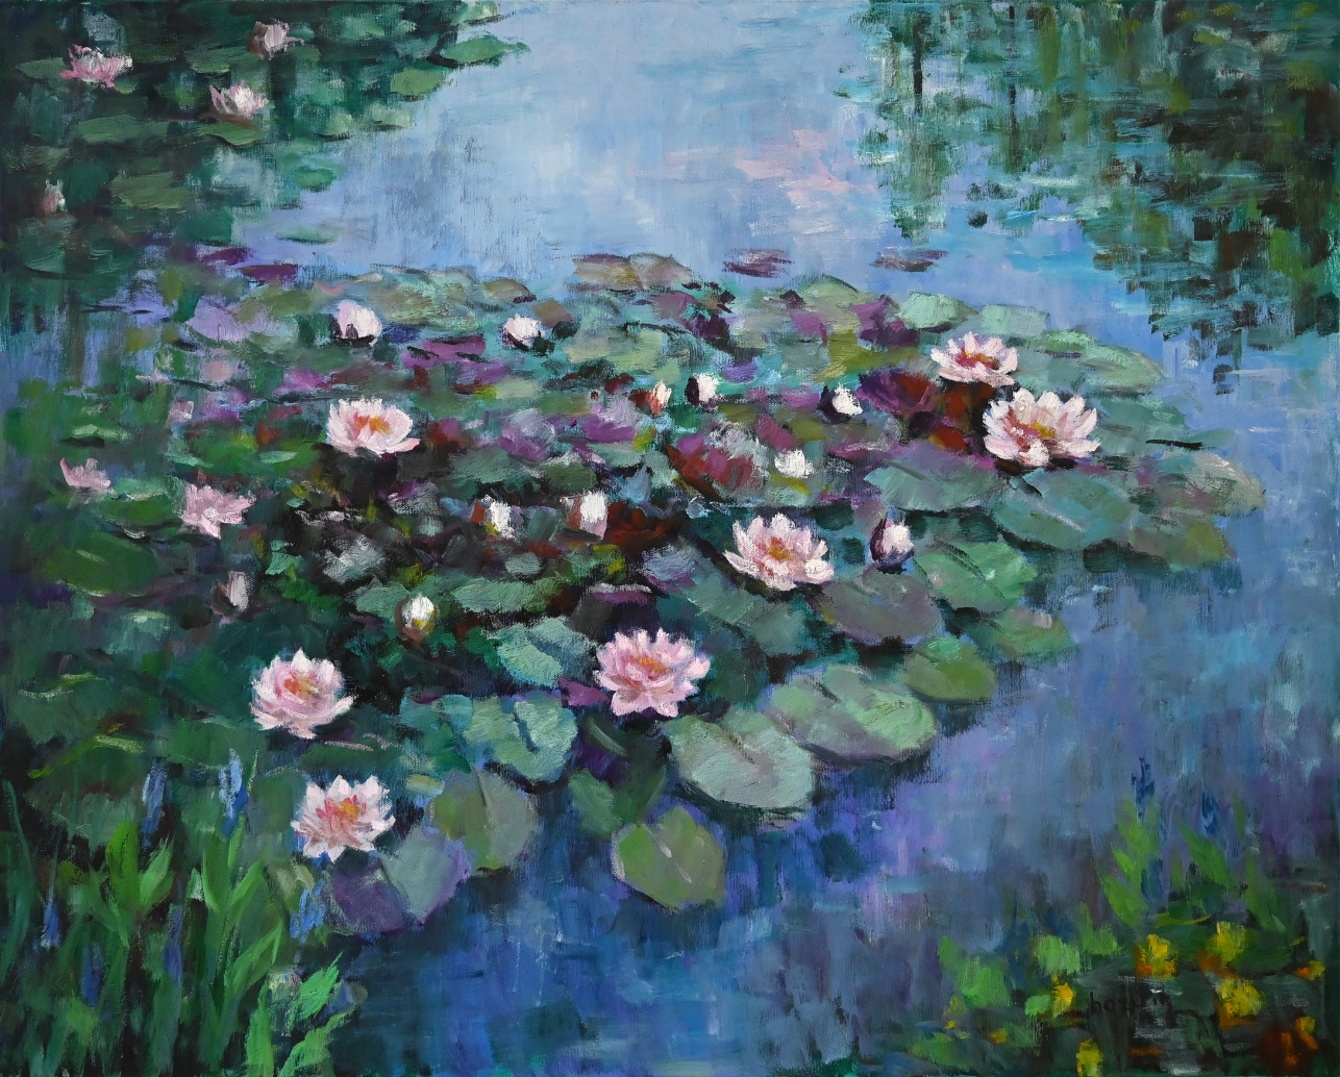 Maler des 20. Jahrhundert » Öl-Gemälde Impressionismus Seerosen